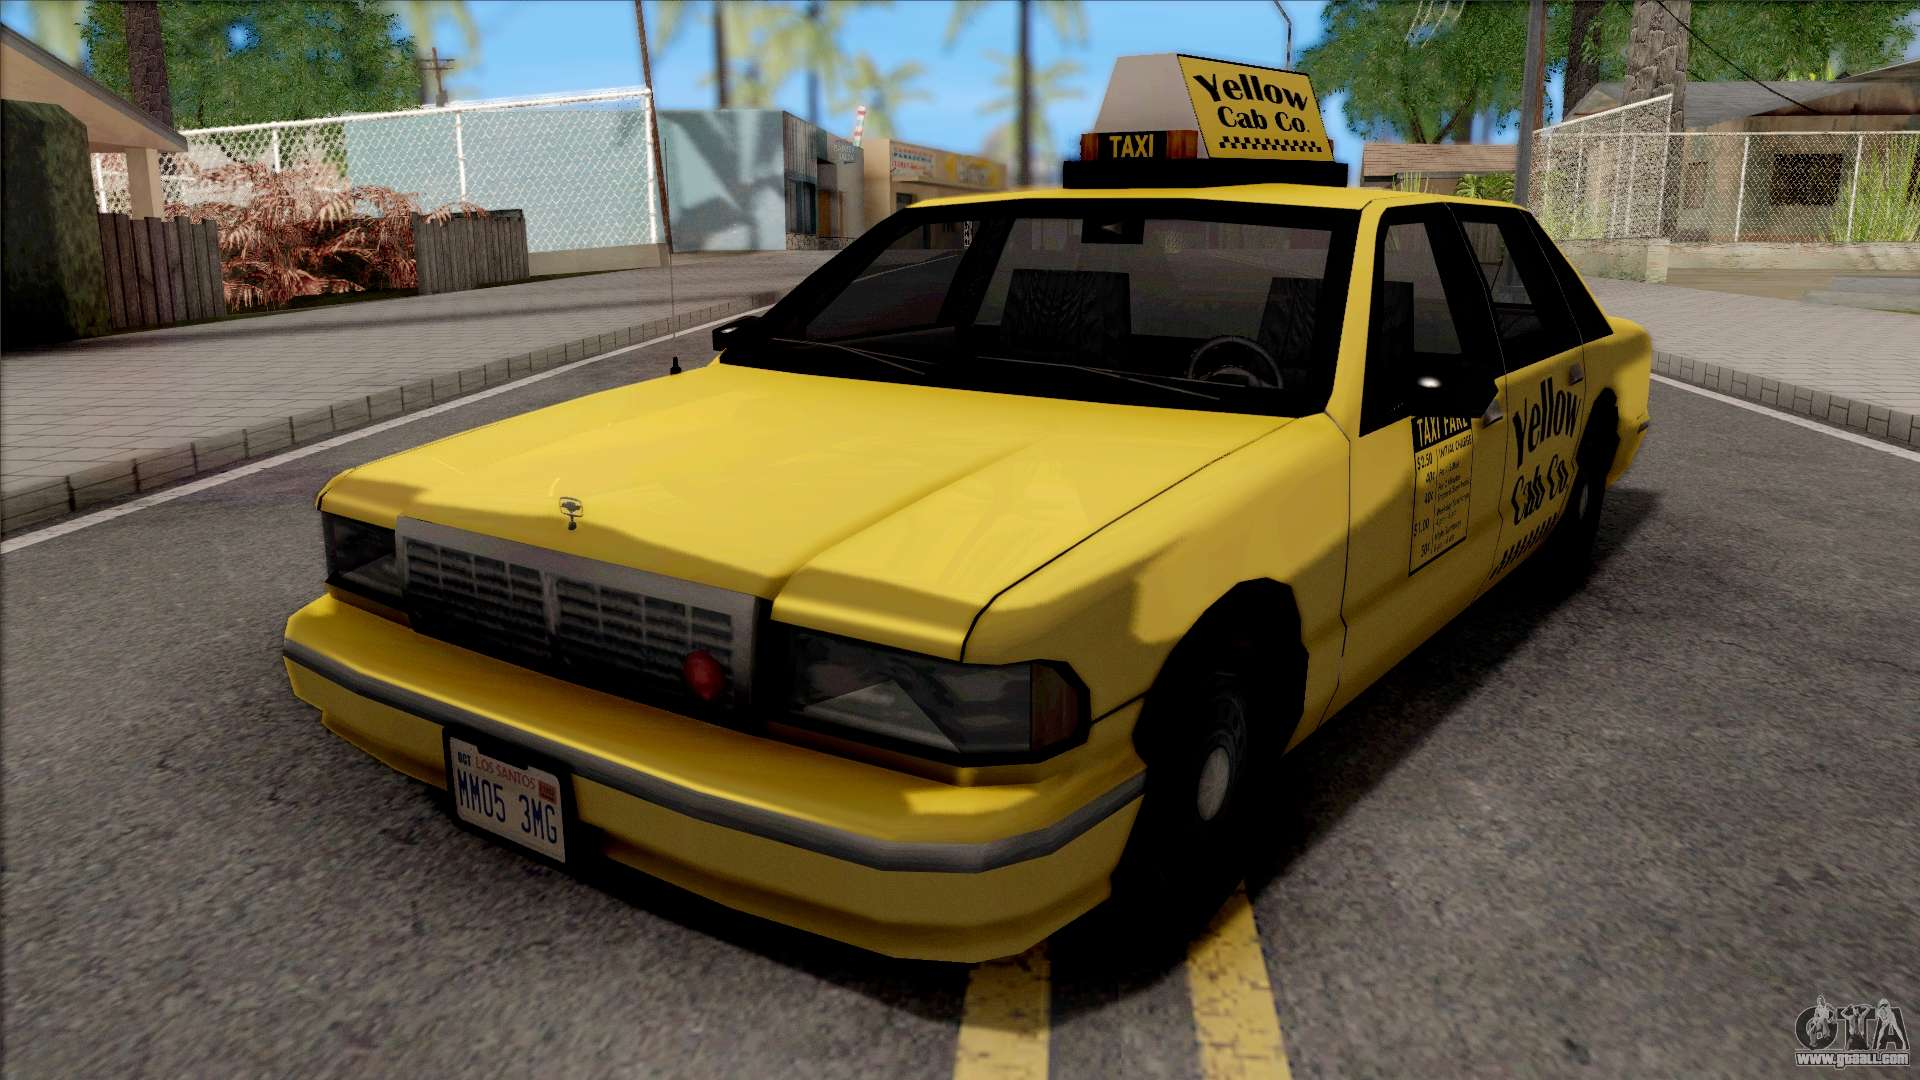 low priced a614a 56b28 yellow cab 42 flachewann.xyz